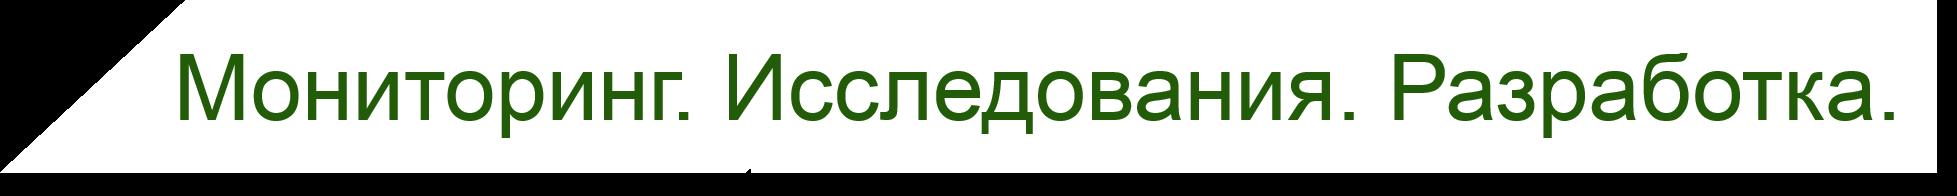 osn_na_slayder_zelen_isprav_0.png